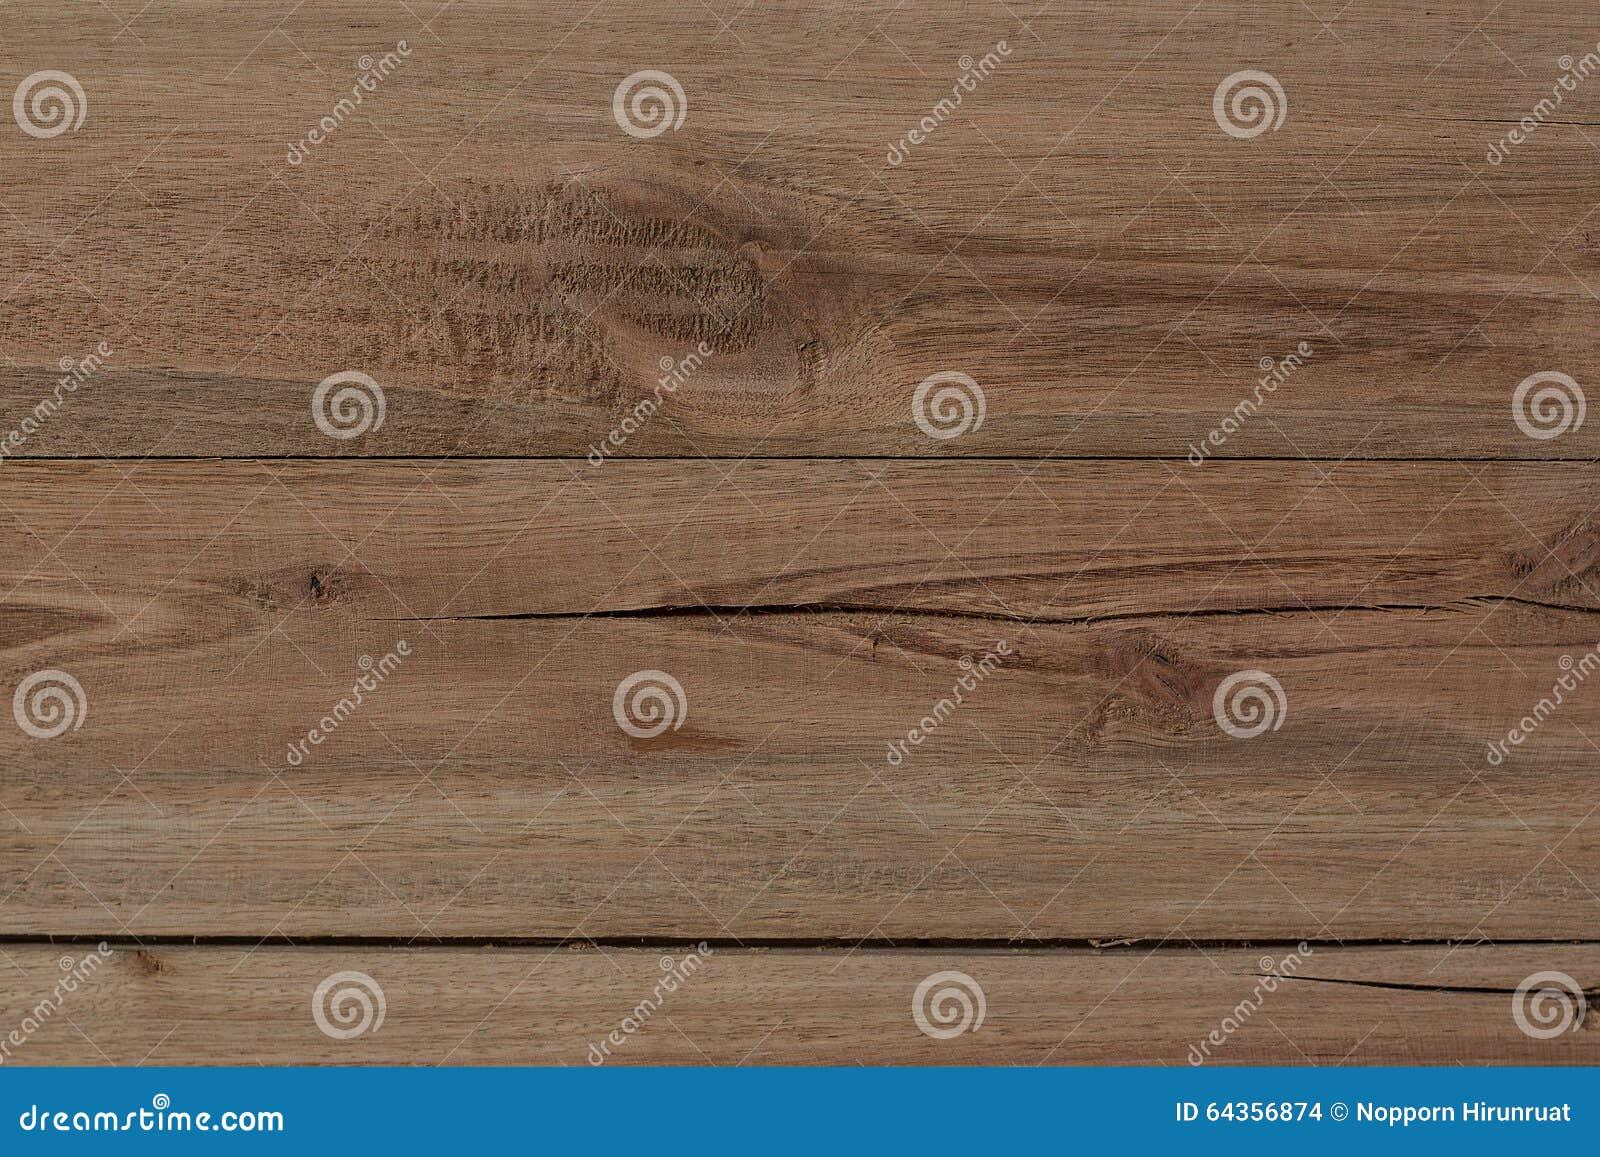 ground texture wood texture stone texture stock photo image of